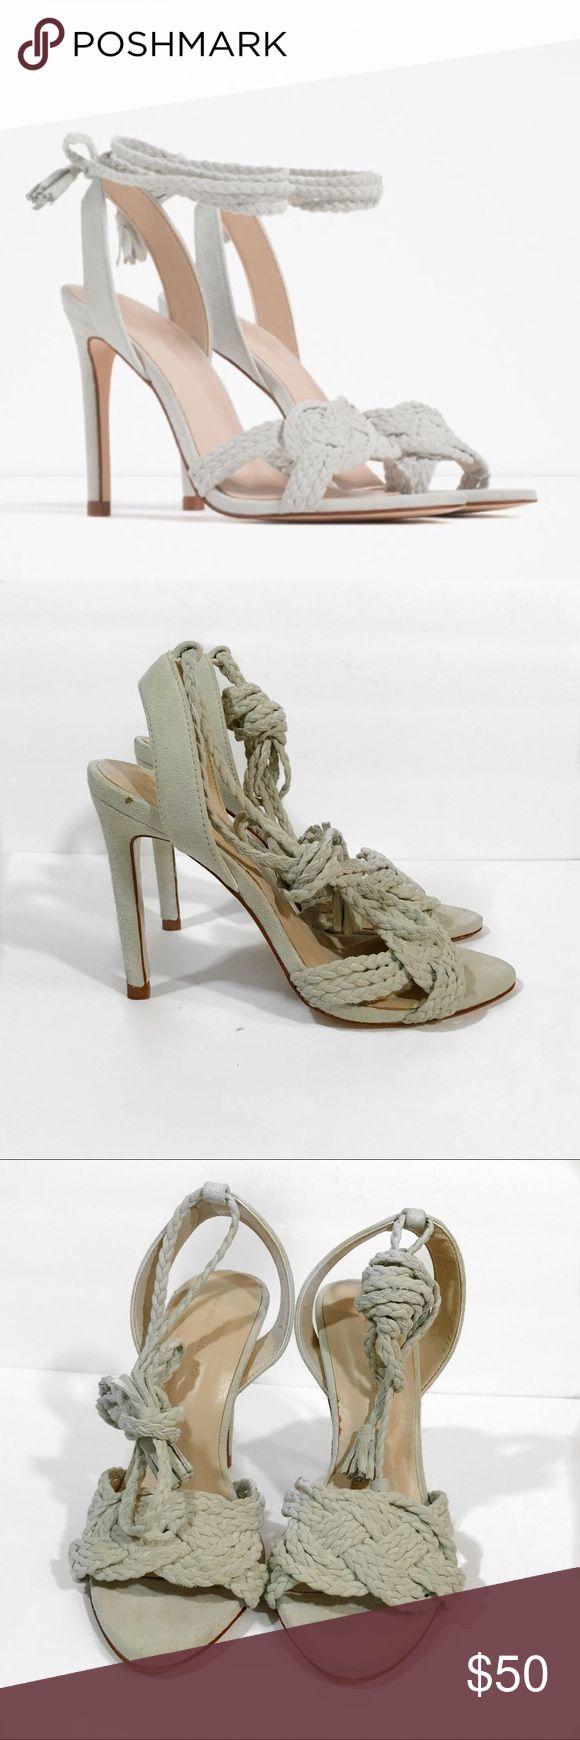 Zara Real Leather Tie Up Heels Zara real leather tie up heels. Size euro 36. Excellent condition. Zara Shoes Heels